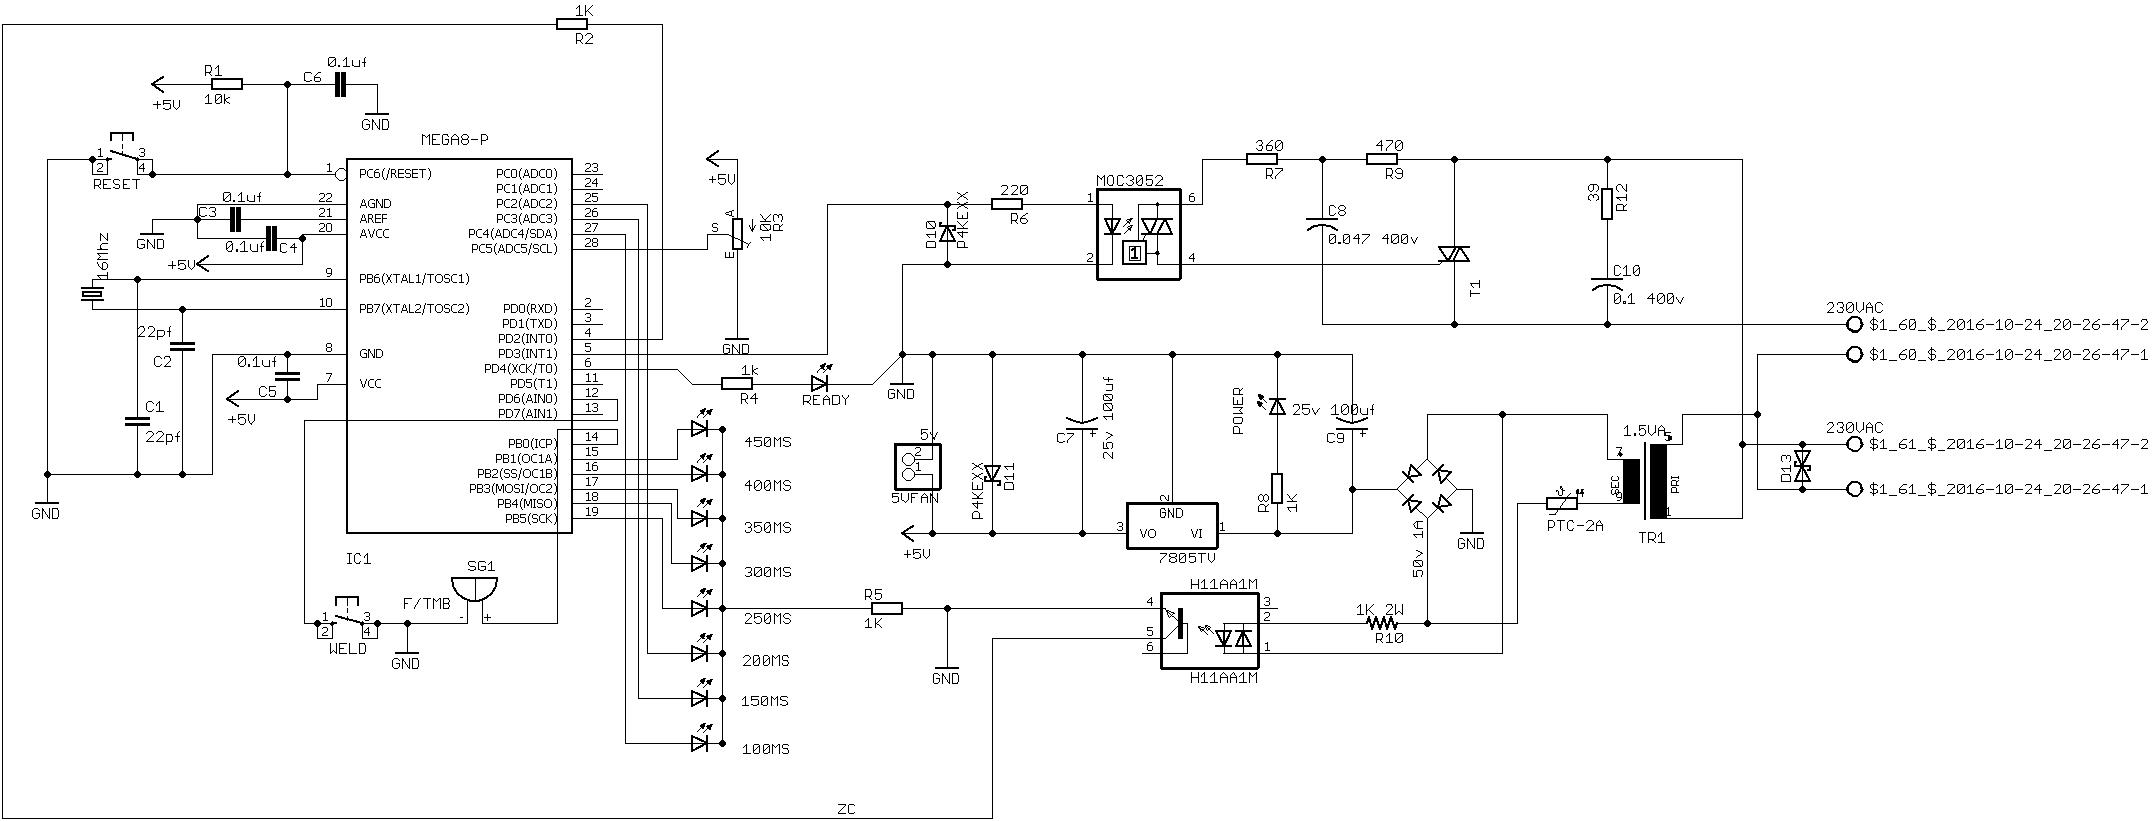 Charmant Kaskadenblockdiagramm Bilder - Elektrische Schaltplan-Ideen ...